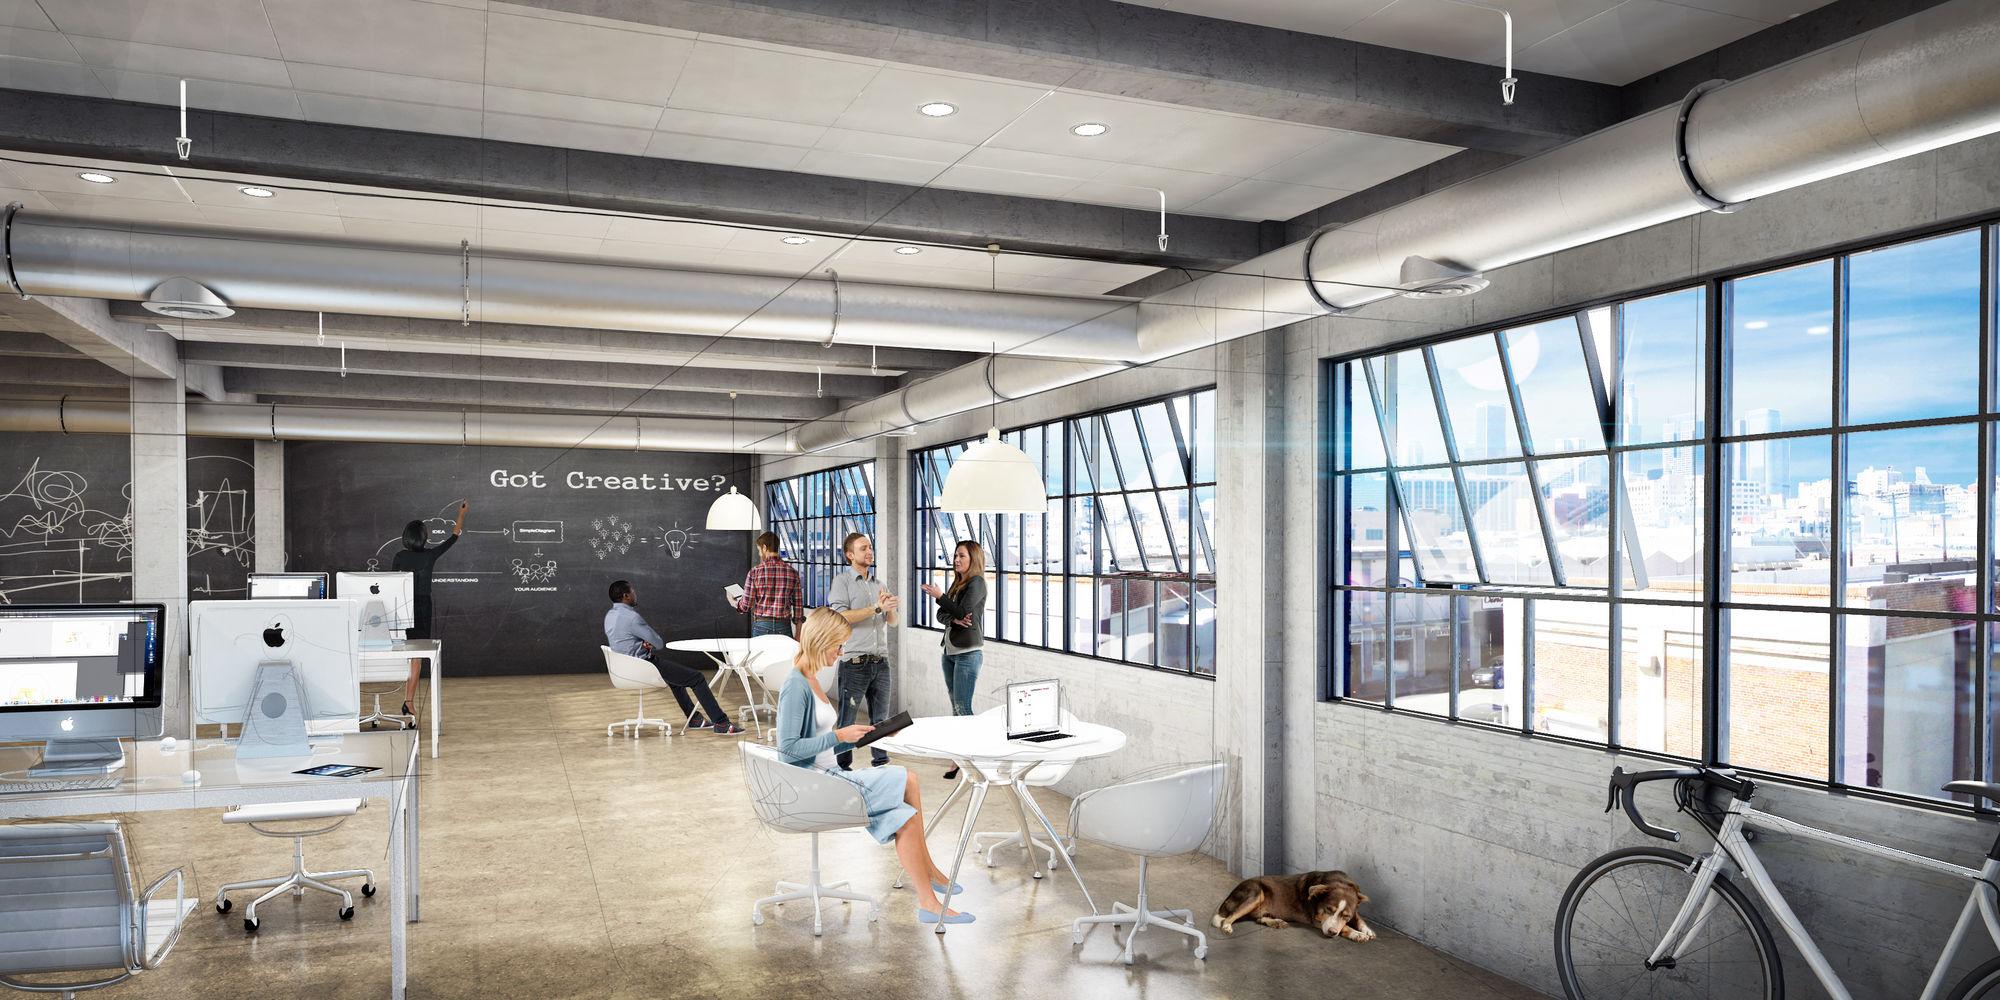 Creative Office Construction - H.W. Holmes, Inc. - Office Tenant Improvements Los Angeles & Ventura